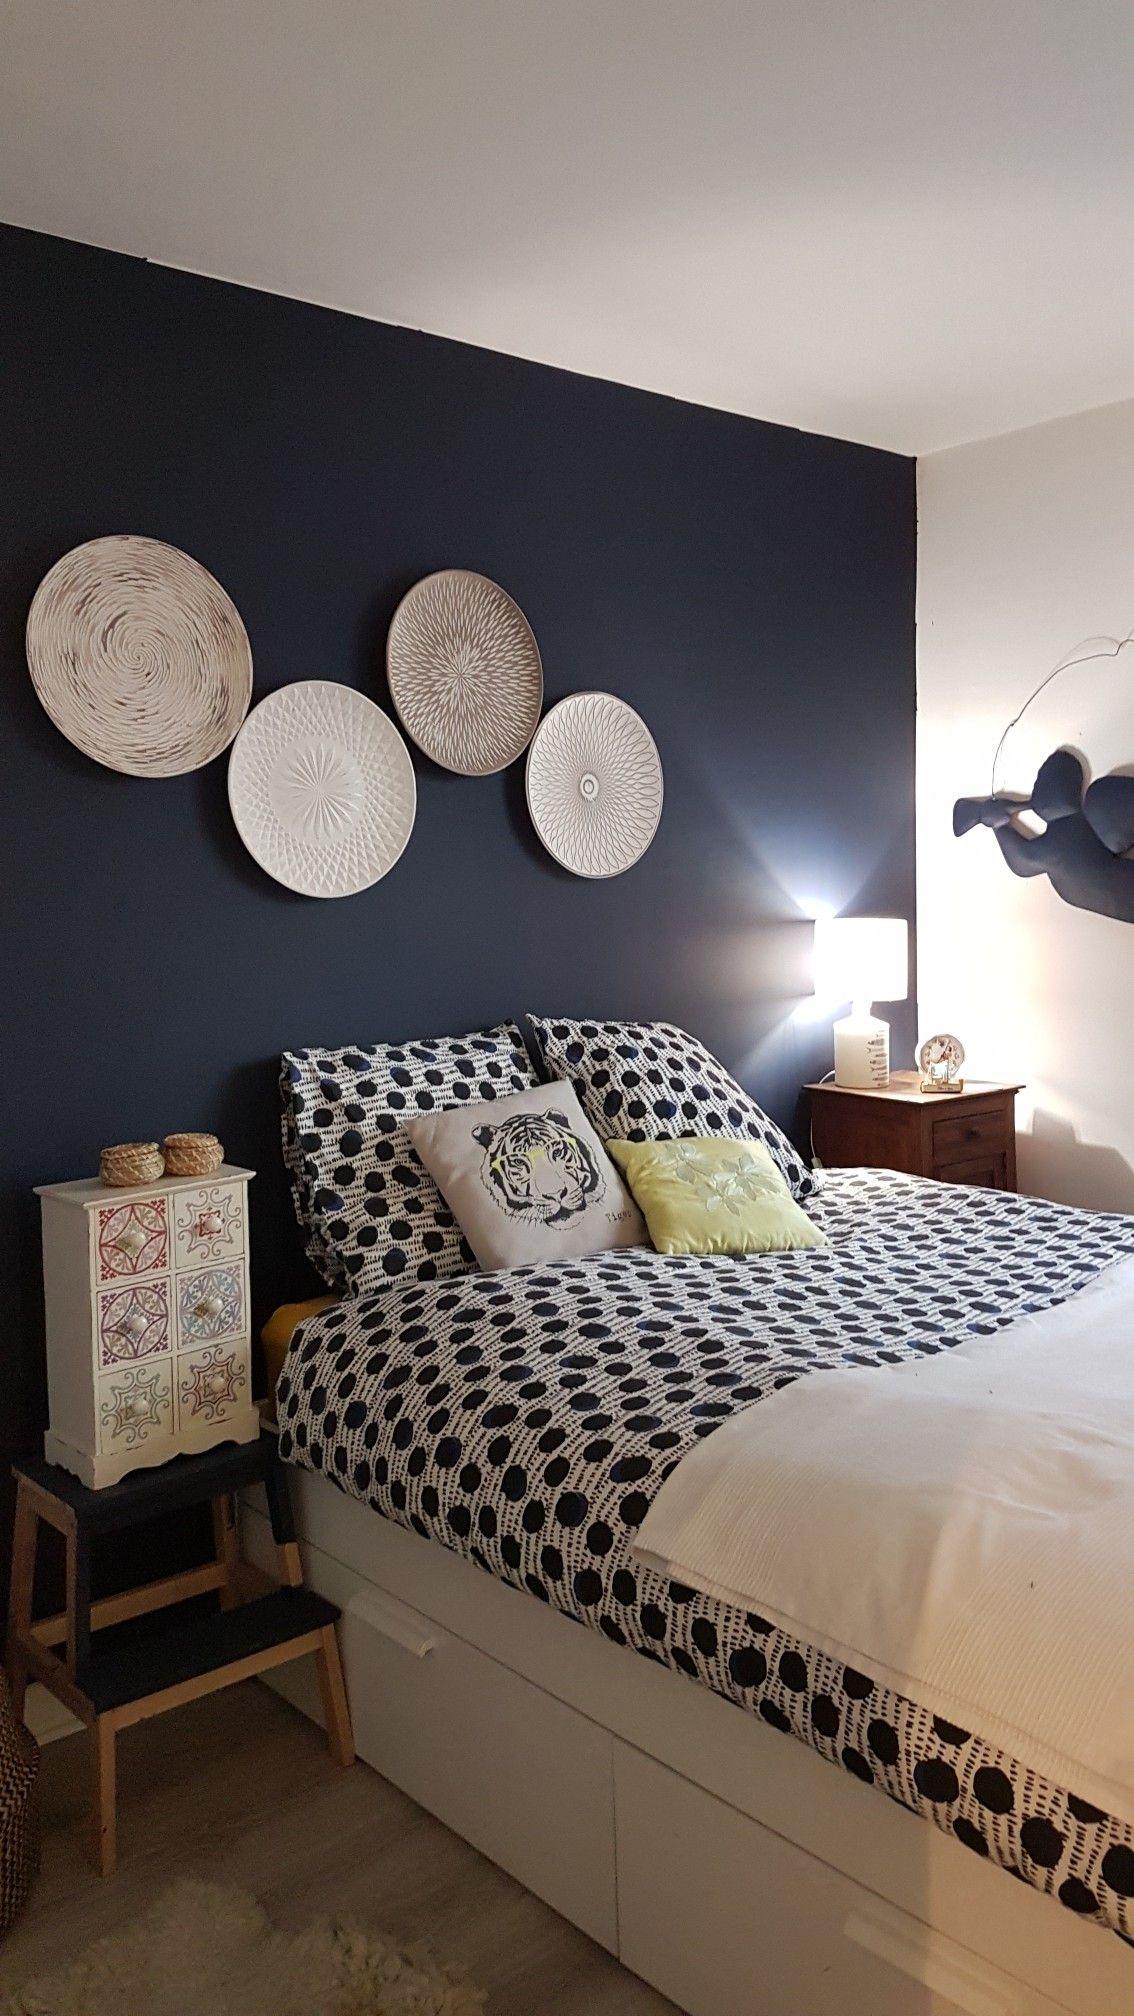 Chambre bleu éclipse #leroymerlin #stockomani #ikea #maisondumonde #laredoute